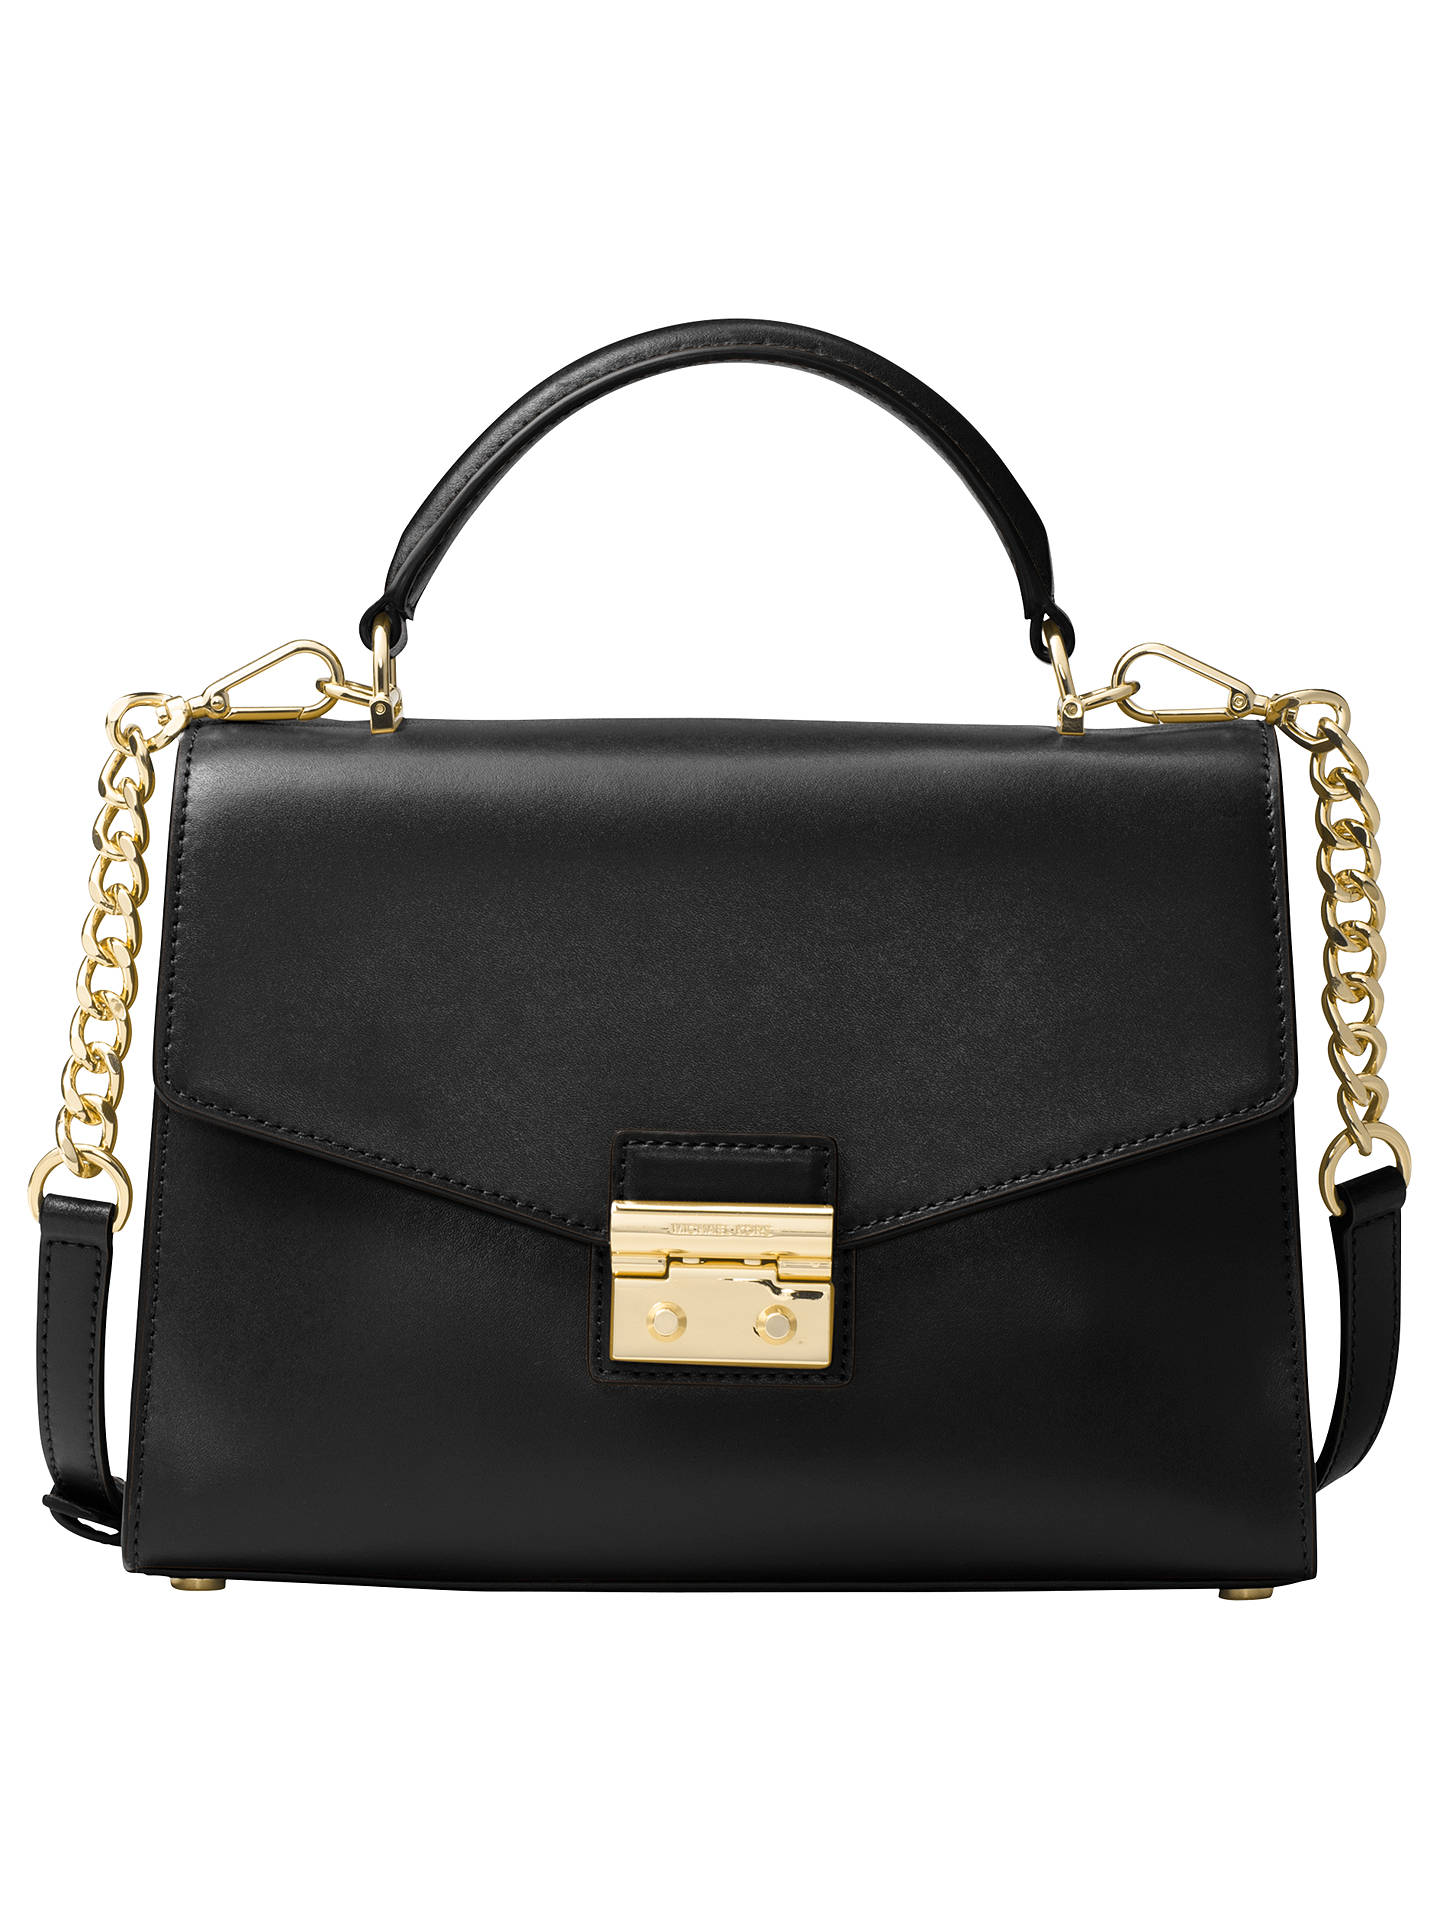 4d0867f7d12e ... get buymichael michael kors sloan leather satchel bag black online at  johnlewis 6fa79 9cf0c